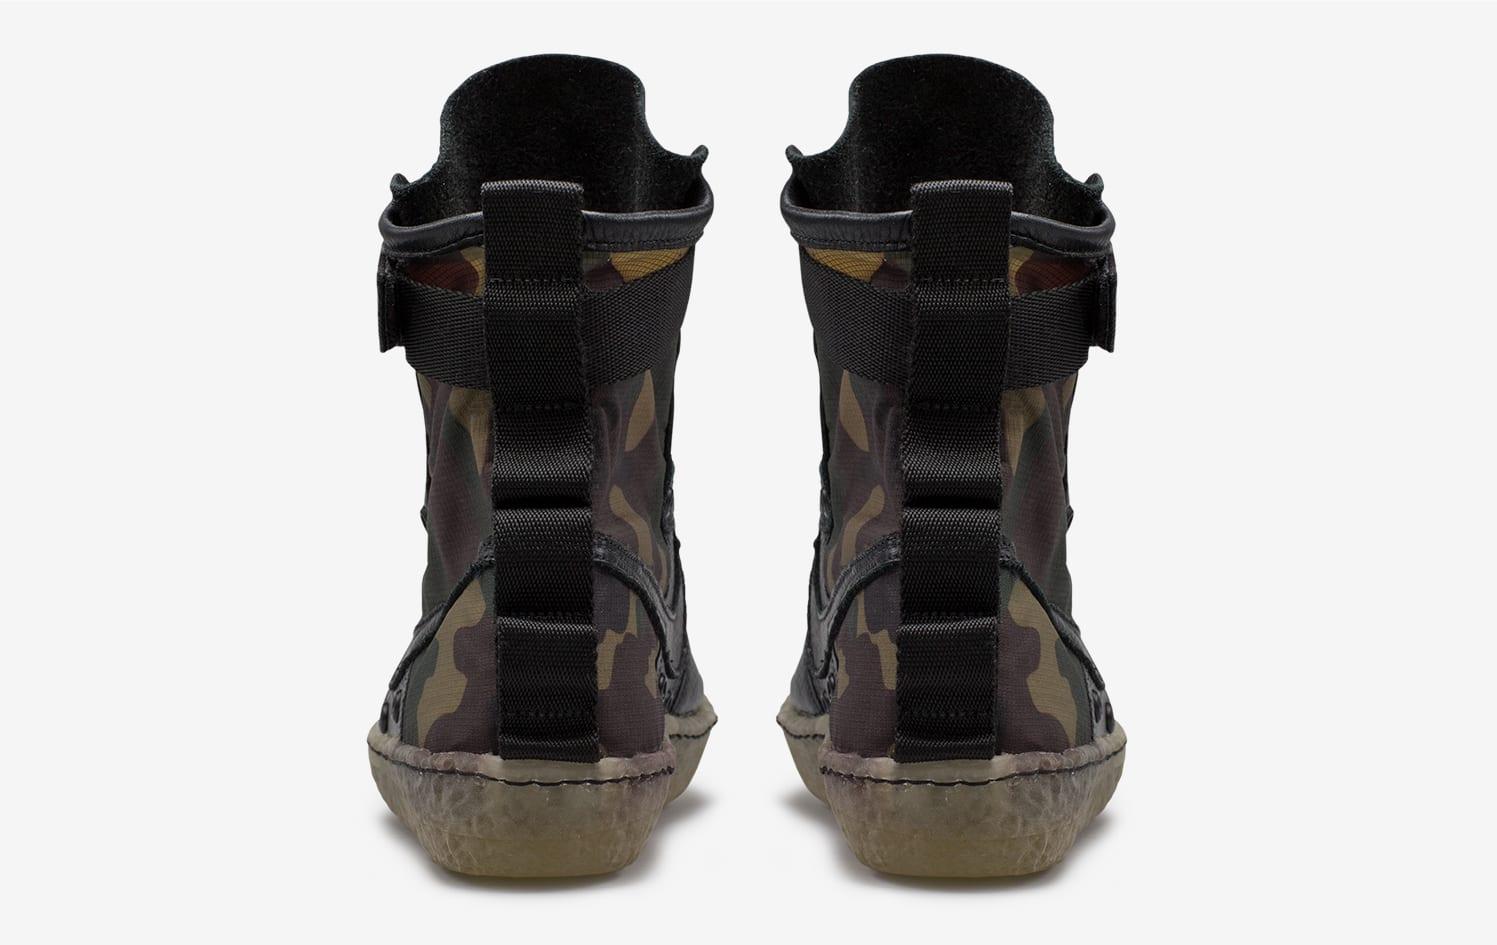 Nike Special Field Air Force 1 Design Heel